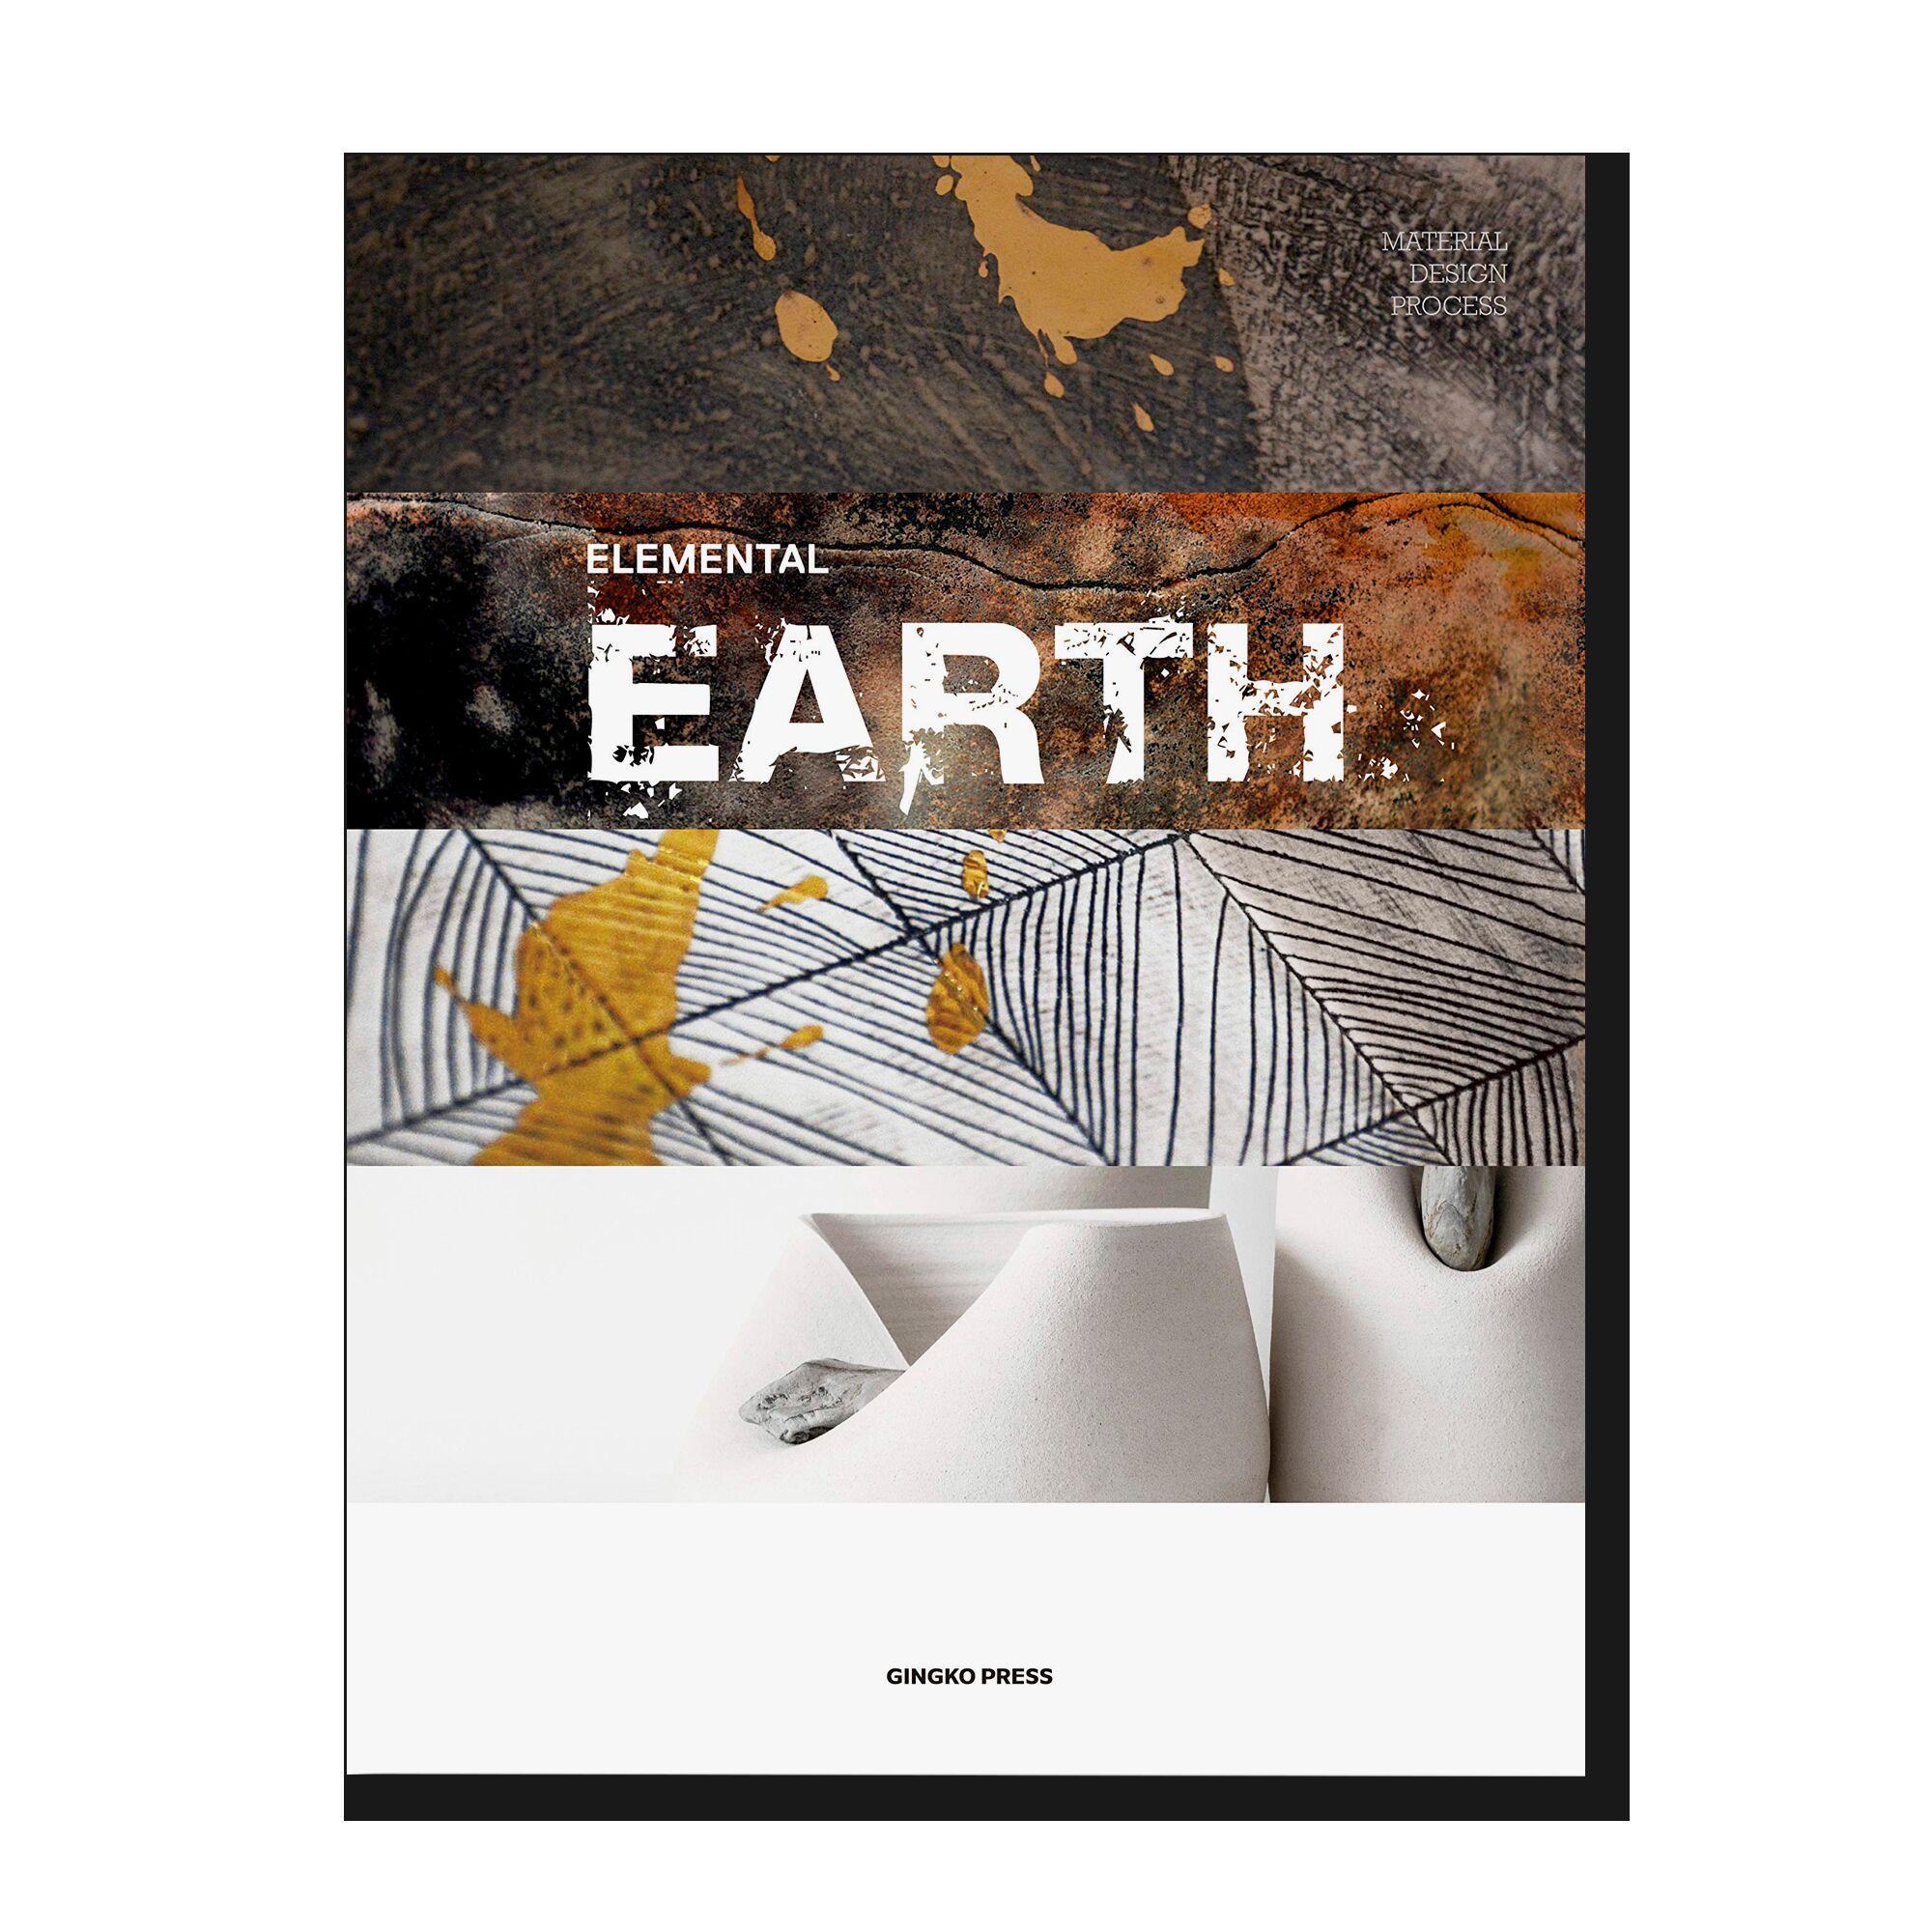 Material Design Process: Elemental Earth